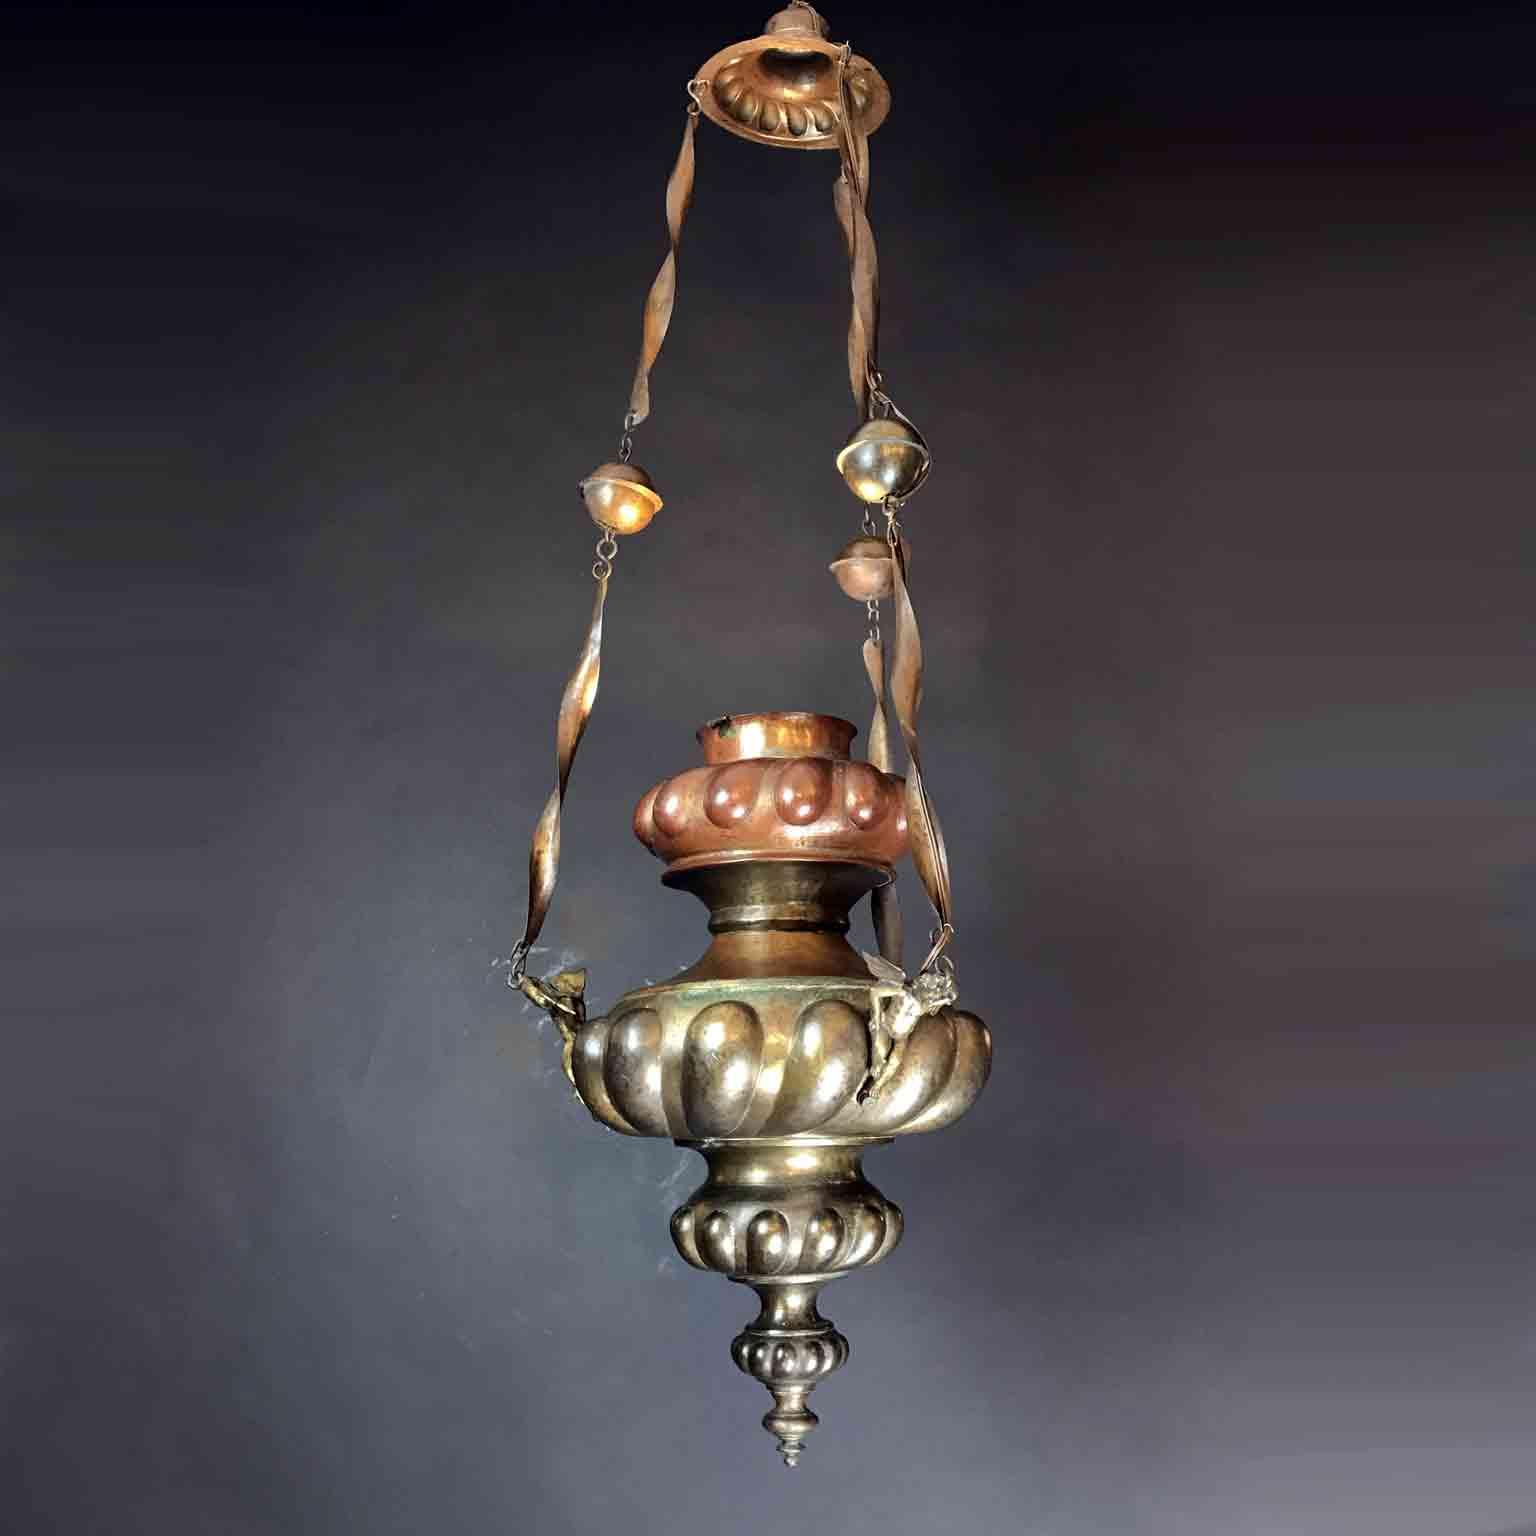 lampada votiva in rame sbalzato